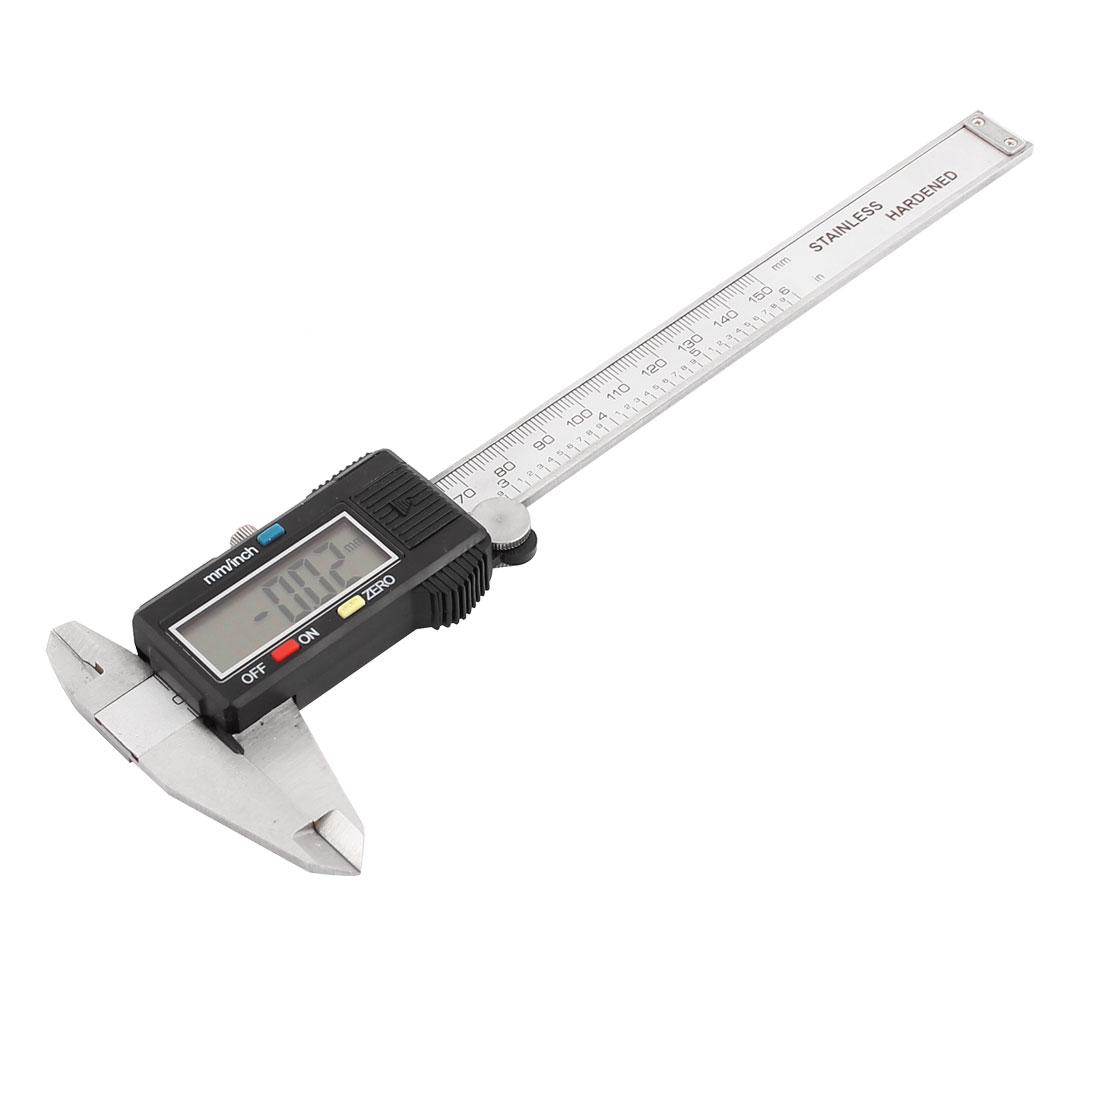 D-14 0-150mm 0.02mm Precision Metalic Mechanical Vernier Caliper Measuring Tool